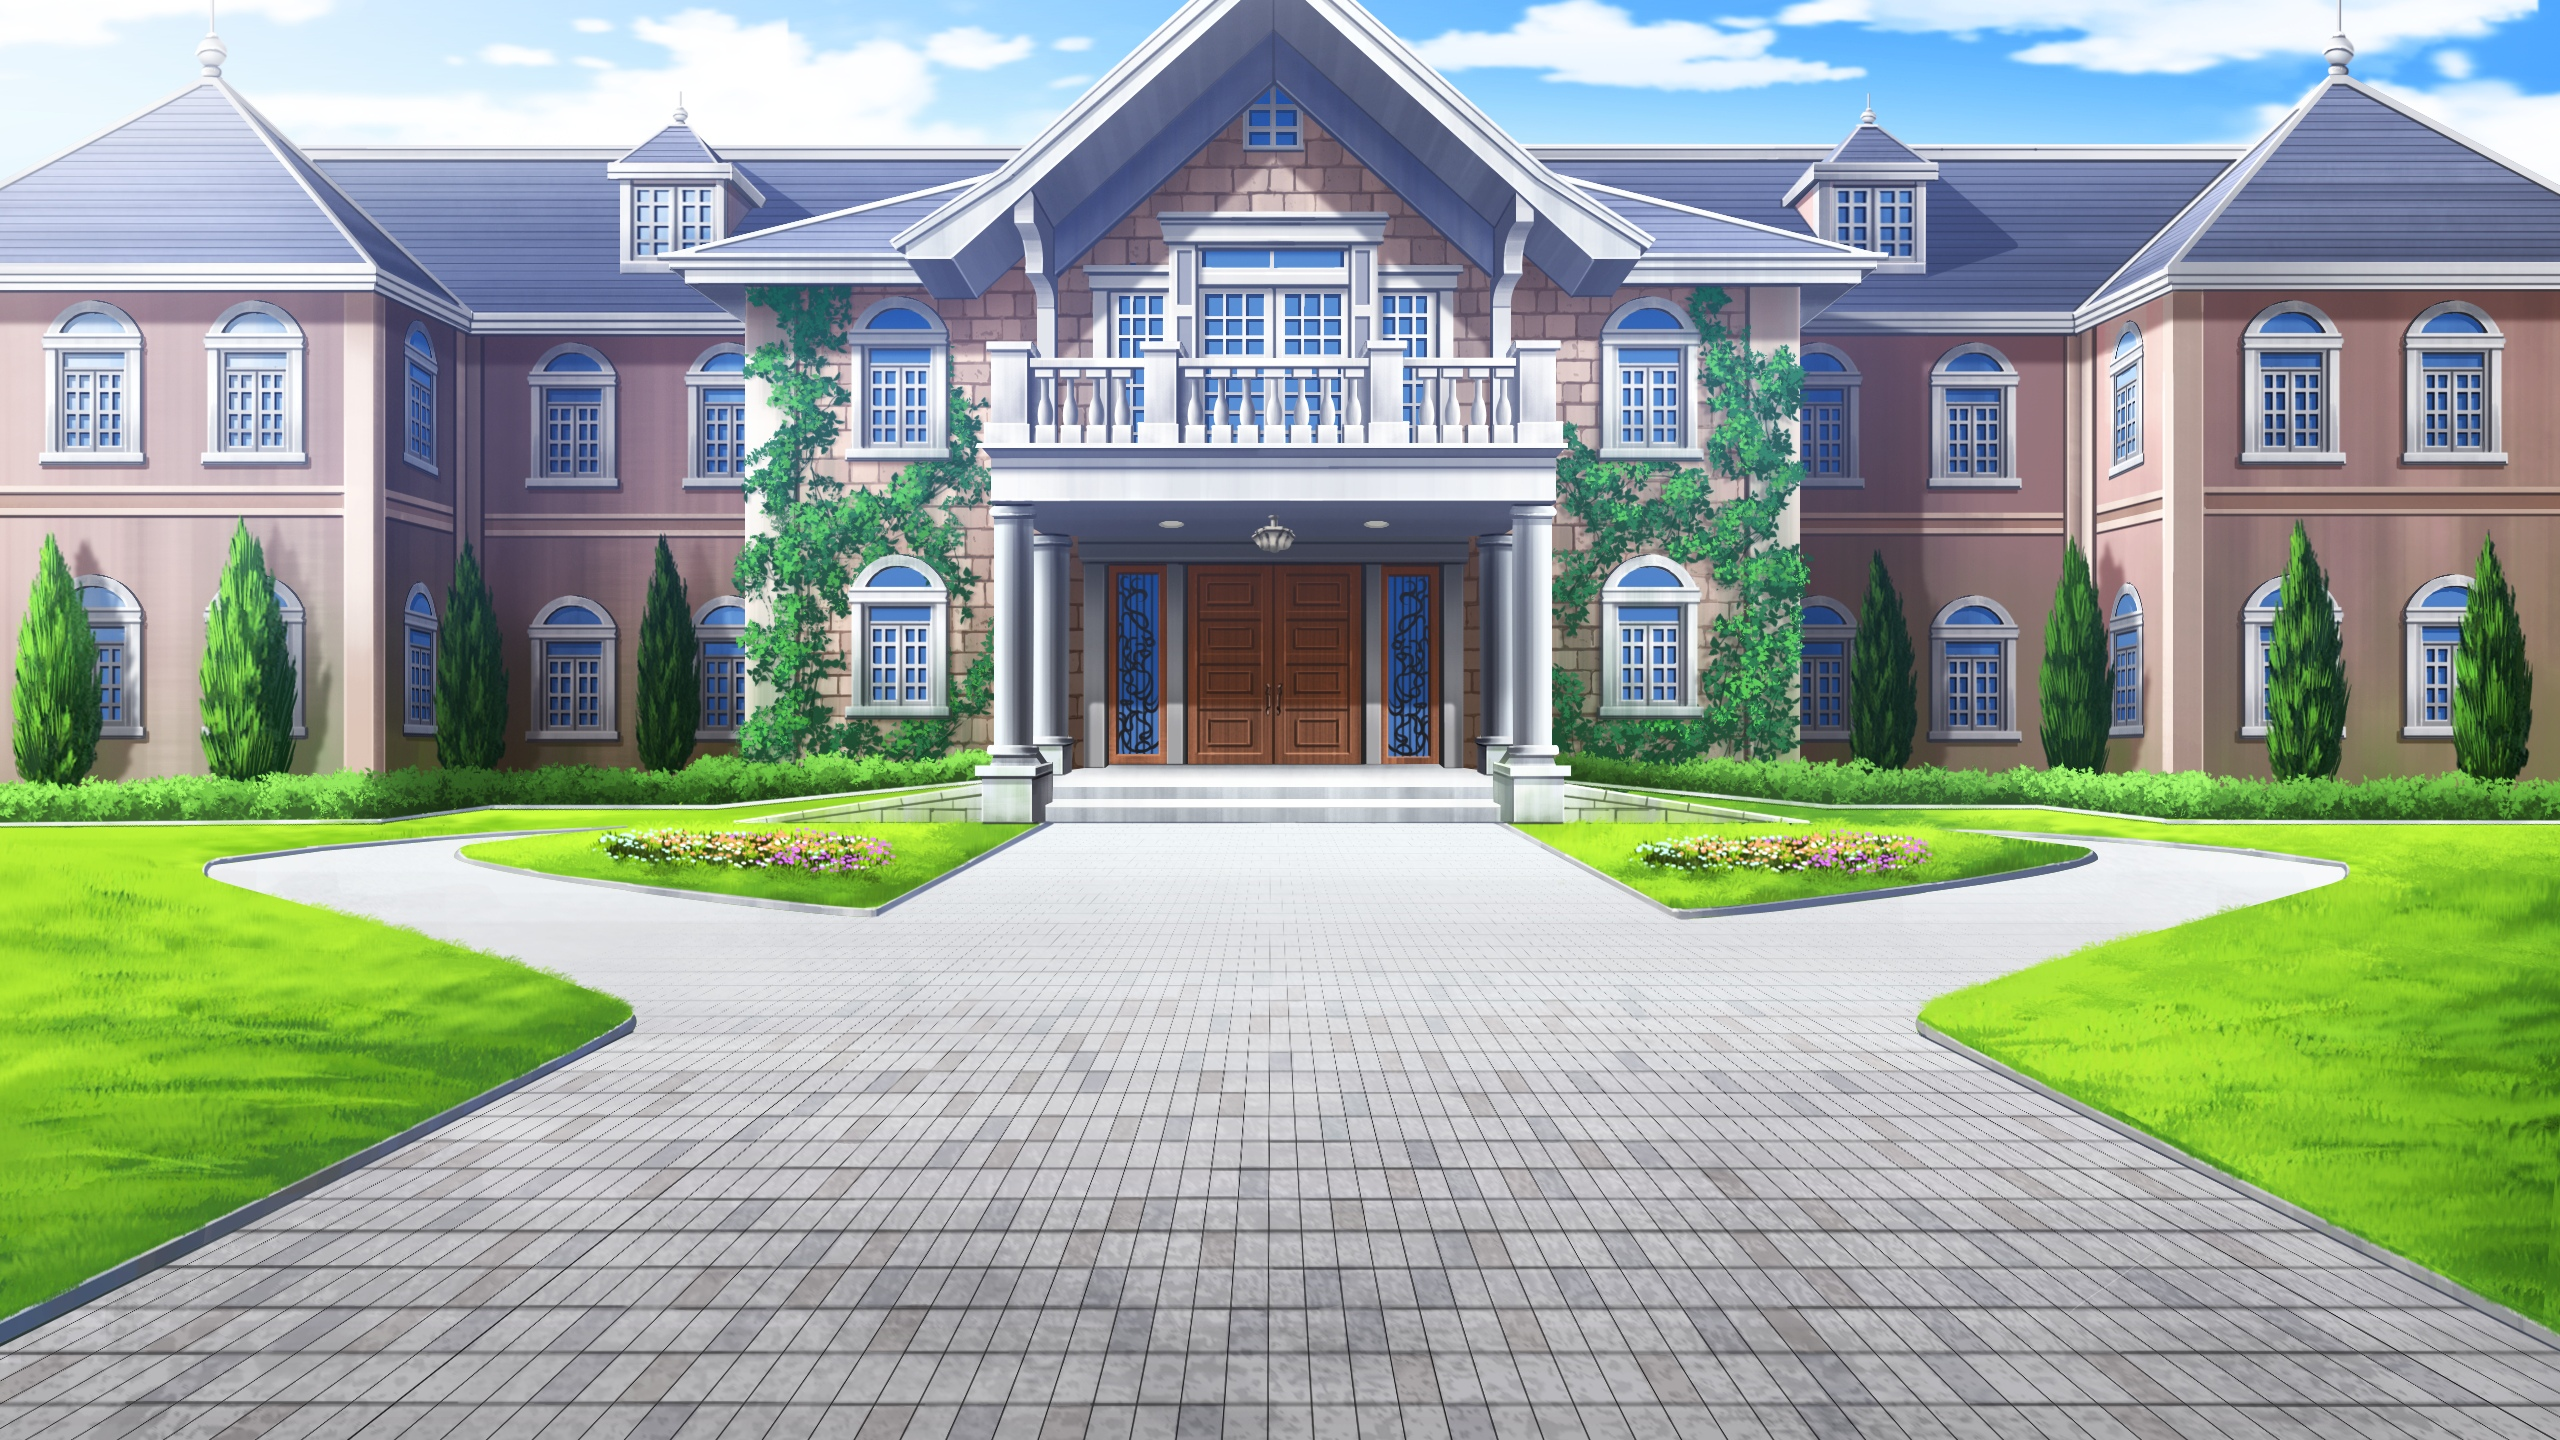 Картинки домов из аниме